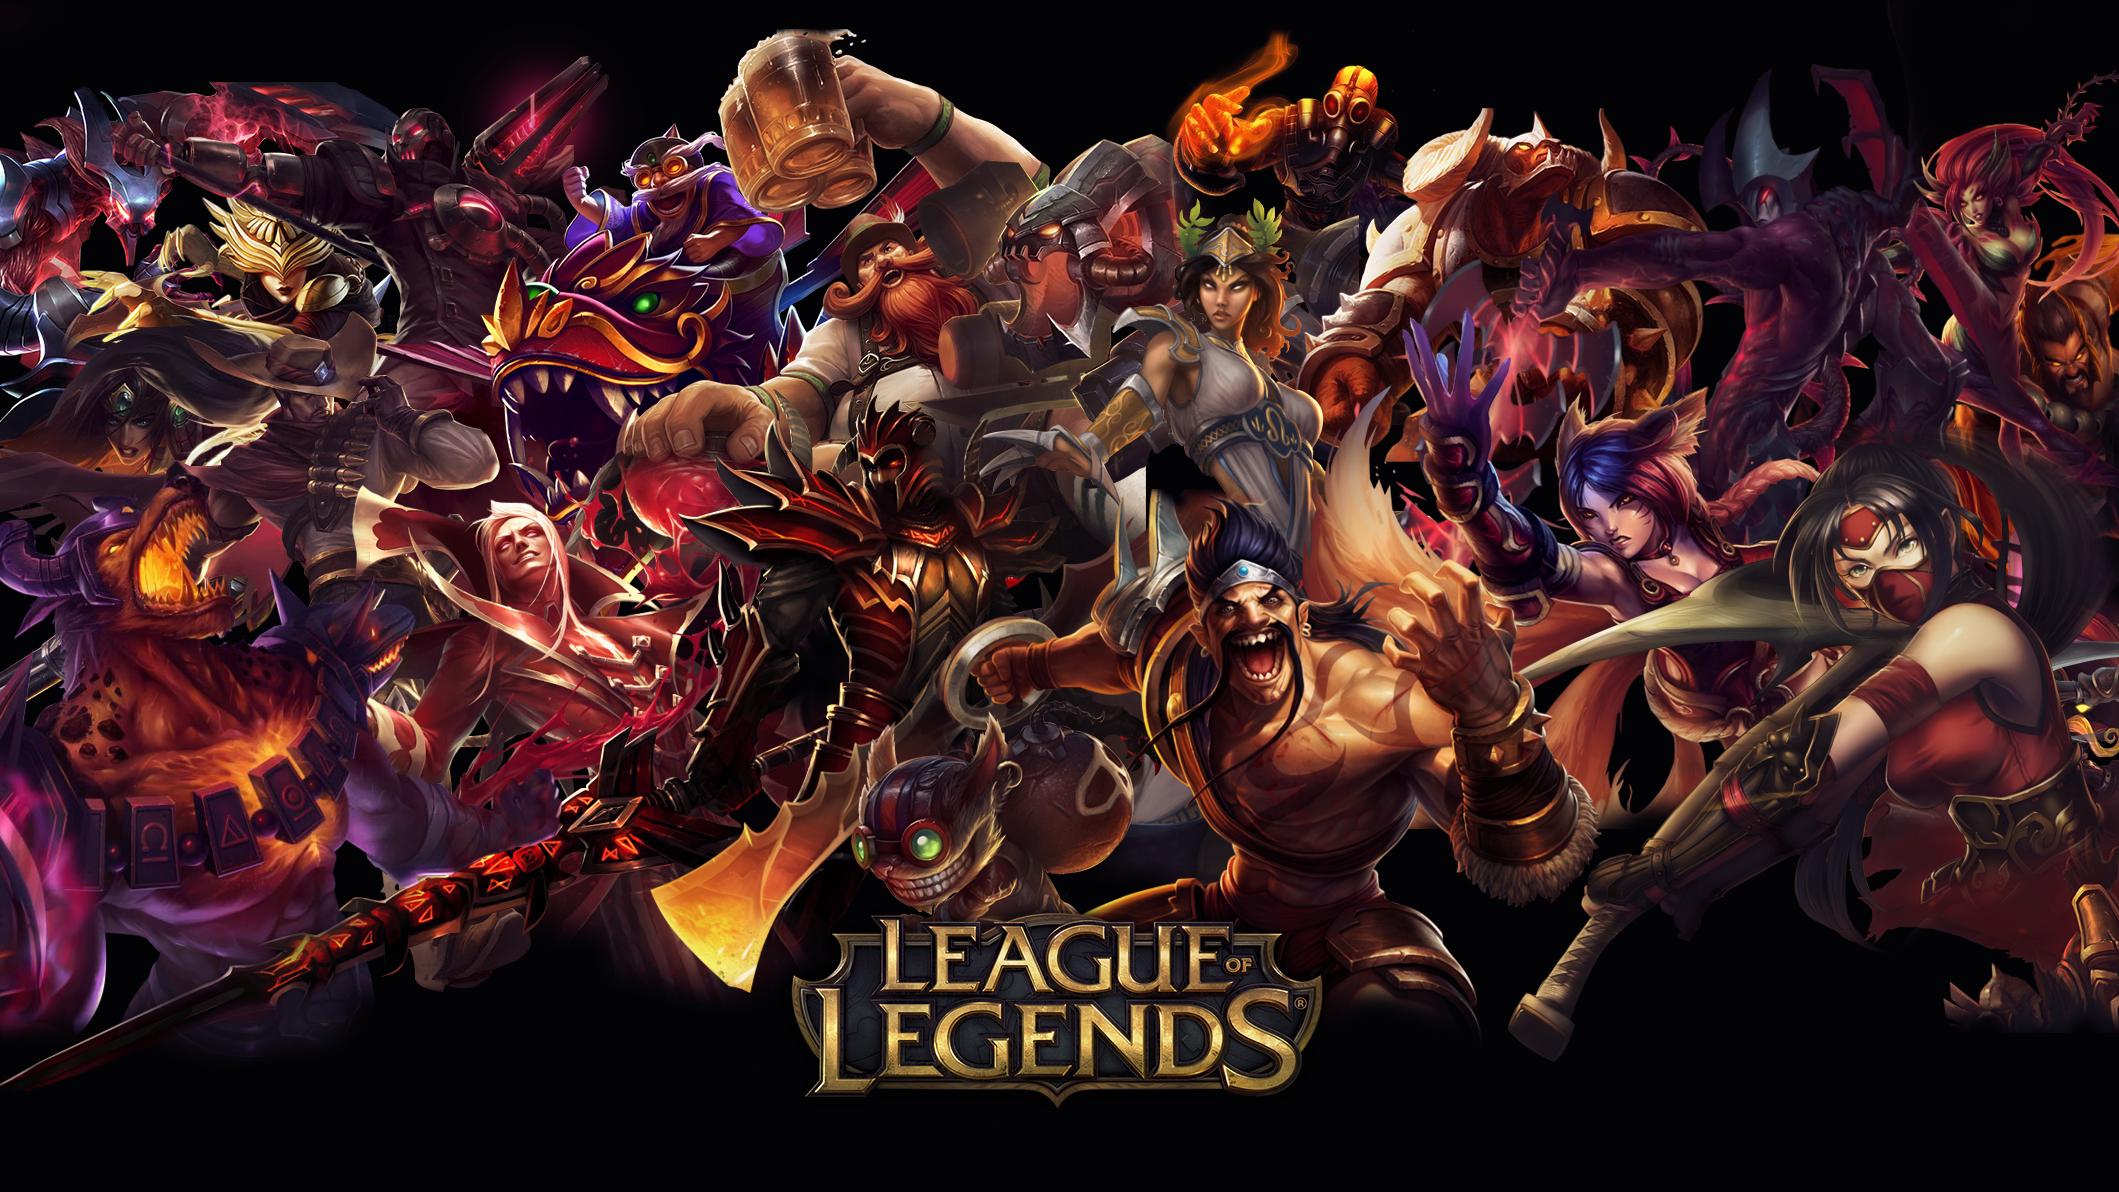 8e71309756d379810a189c81dae6244b - Using Vpn For League Of Legends